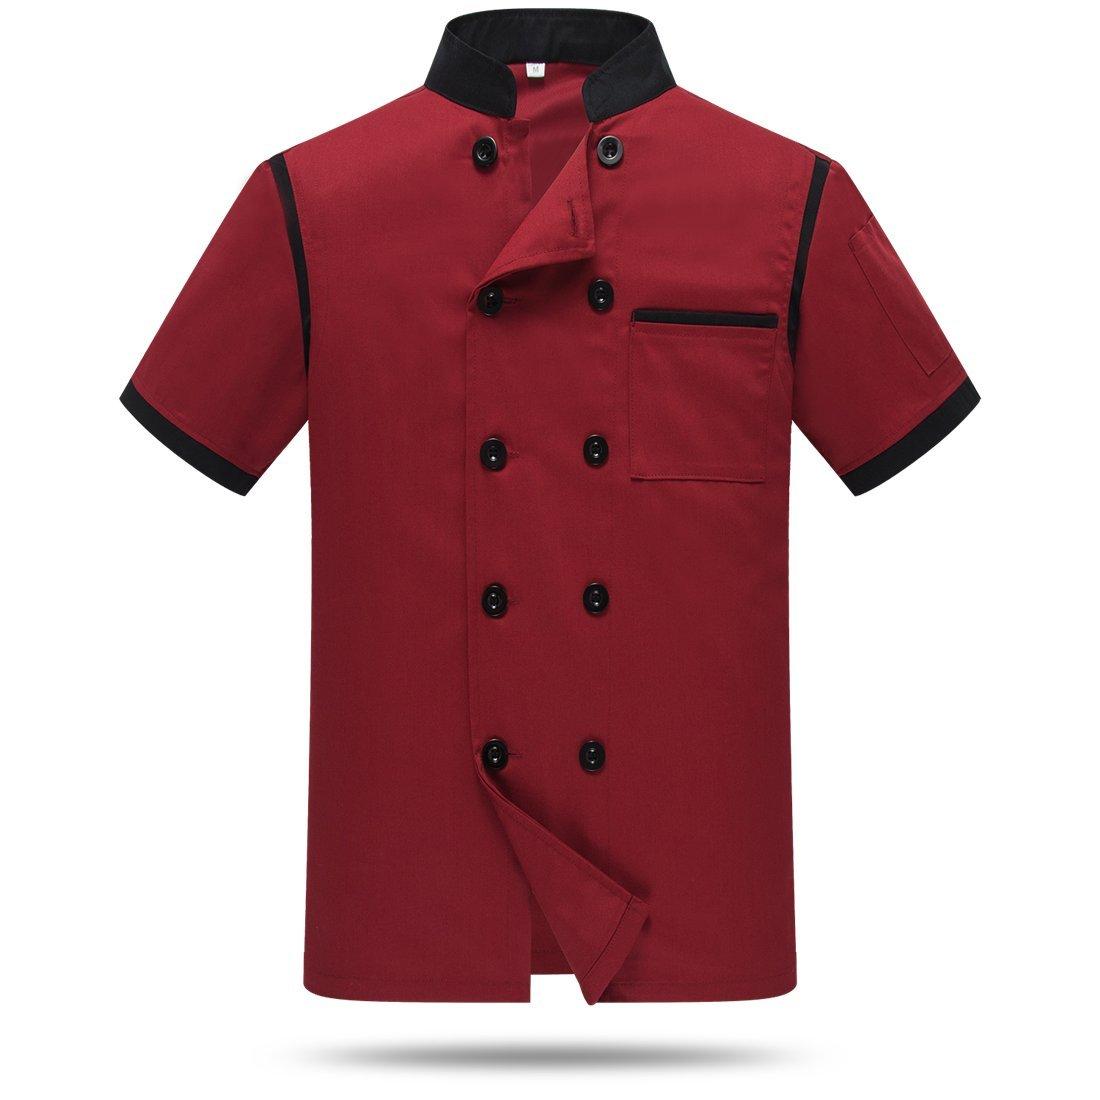 Chef Jackets Waiter Coat Short Sleeves Back and Underarm Mesh WAIWAIZUI